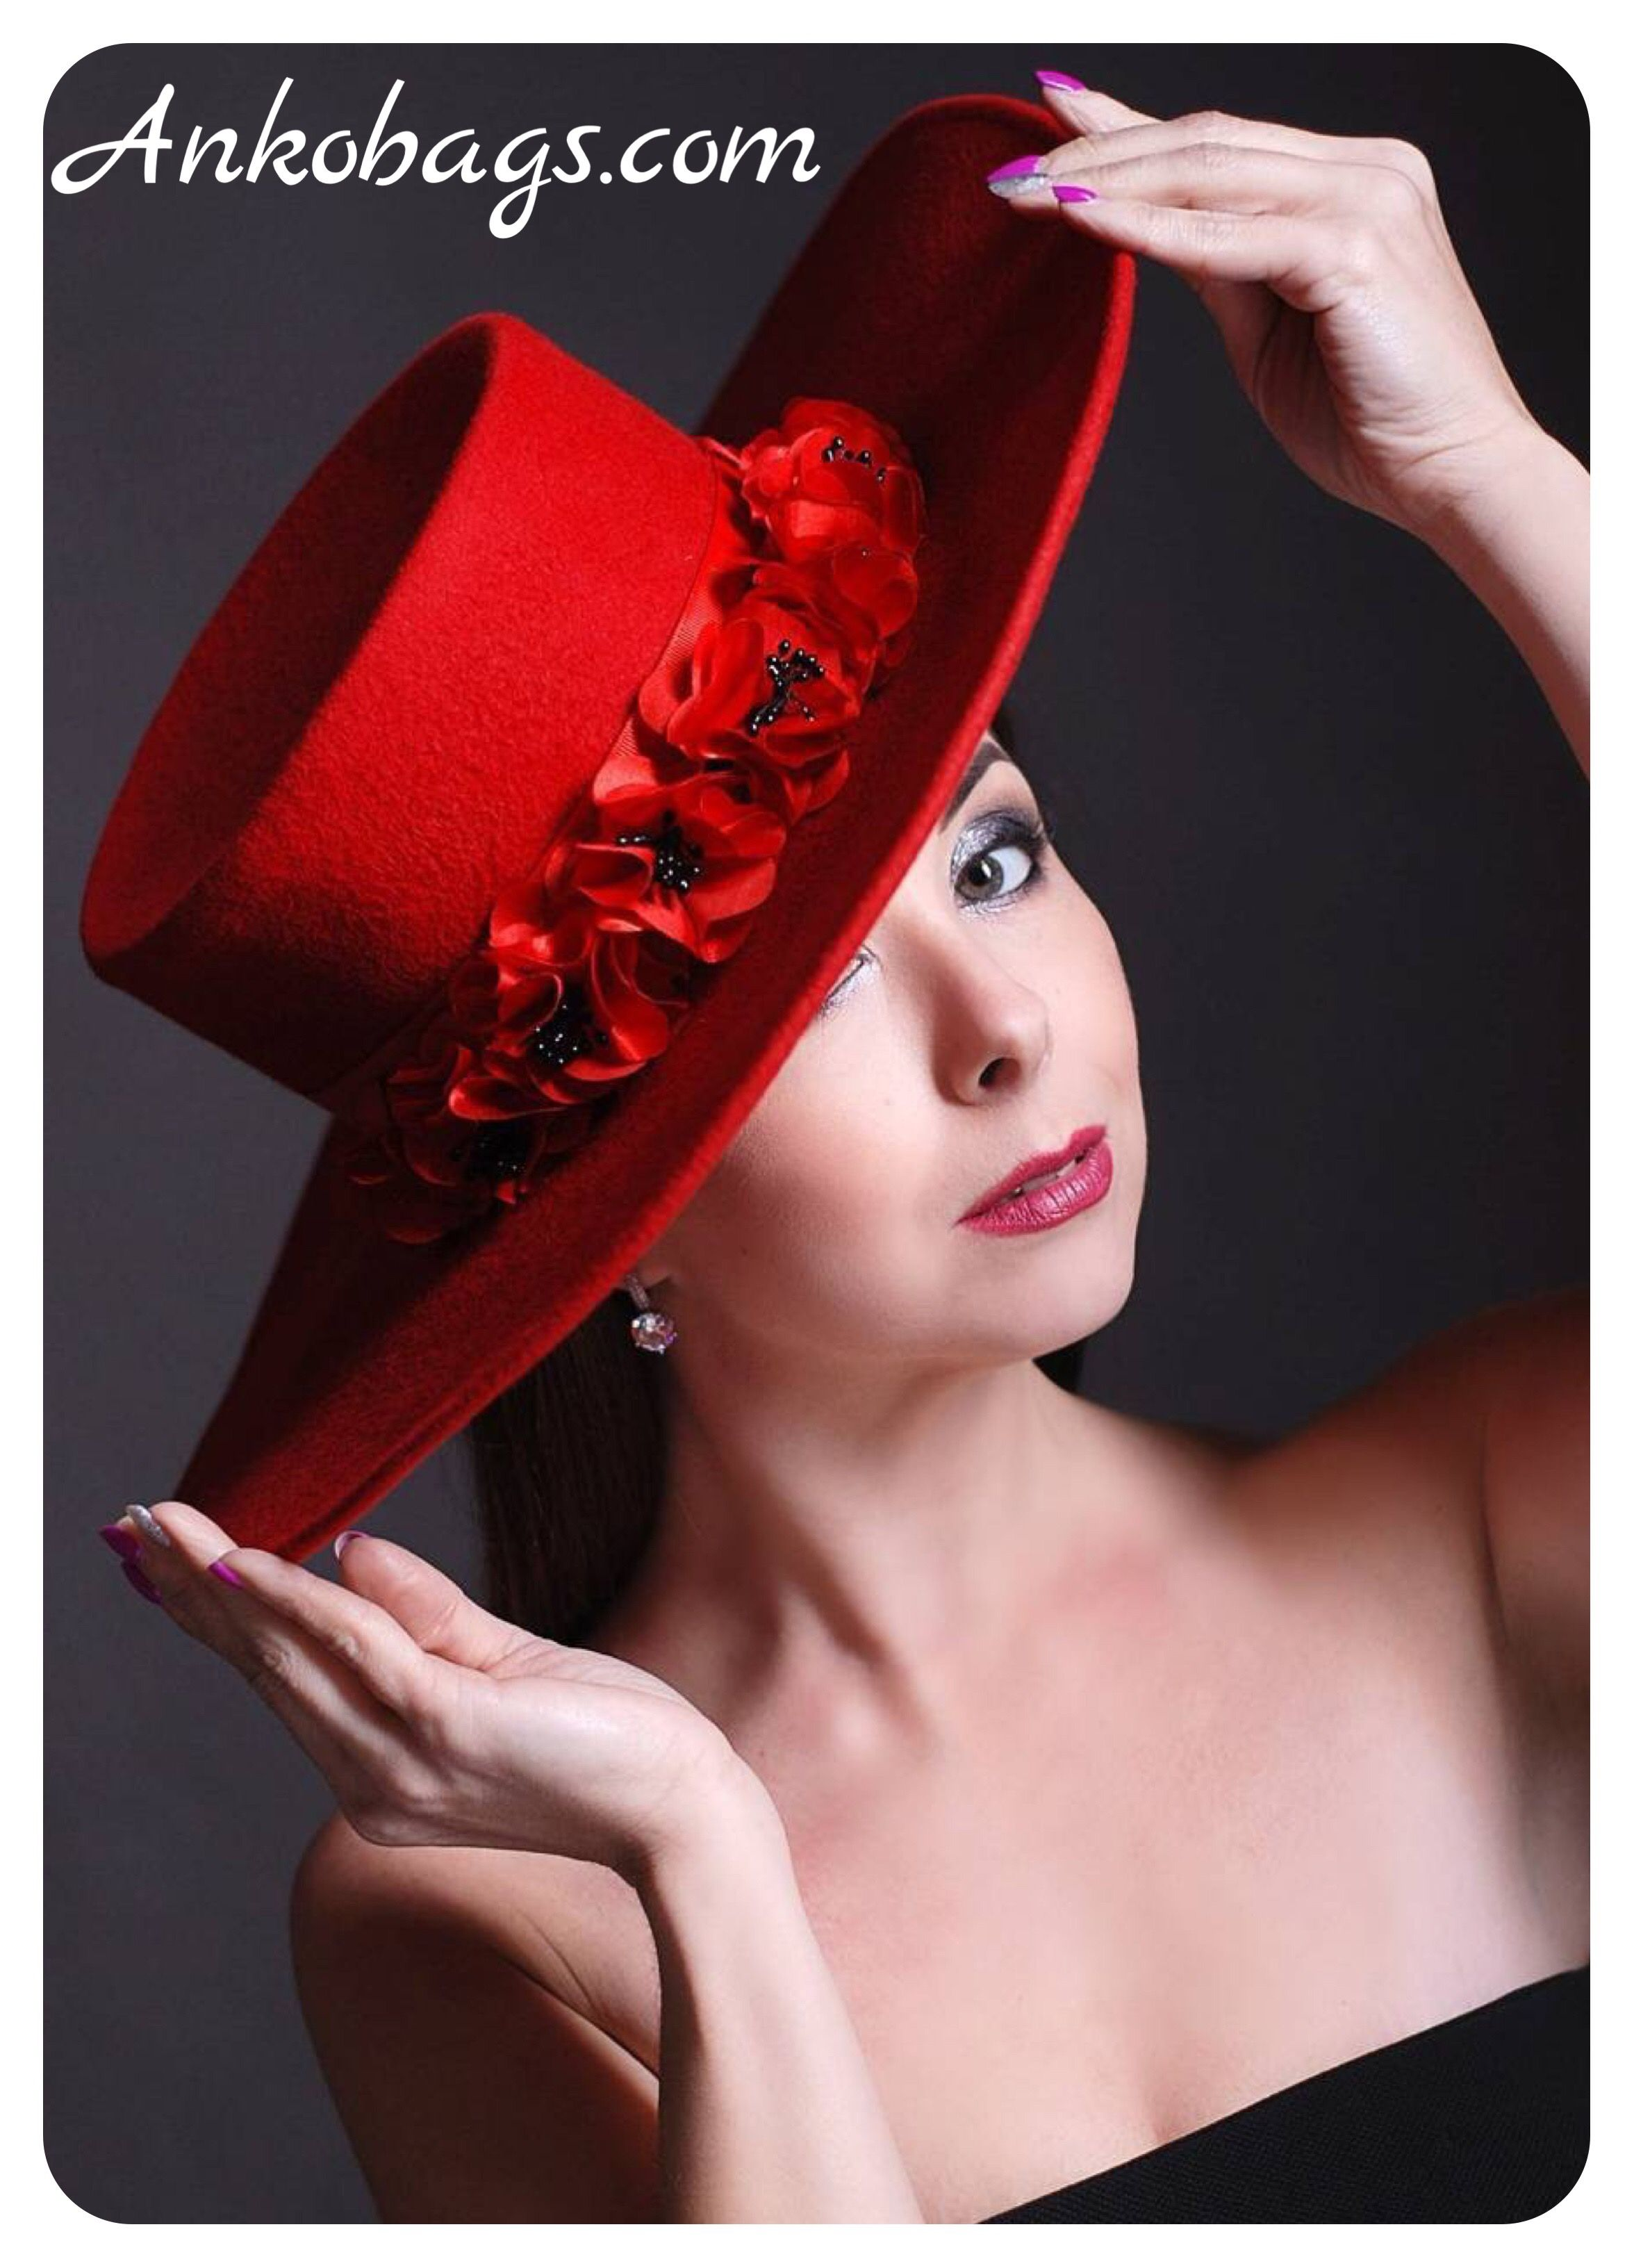 Women S Designer Hats Men S Fashion Hats Fedora Hats Straw Hats Wedding Hats And Other Occasion Hats Q Women Hats Fashion Mens Hats Fashion Occasion Hats